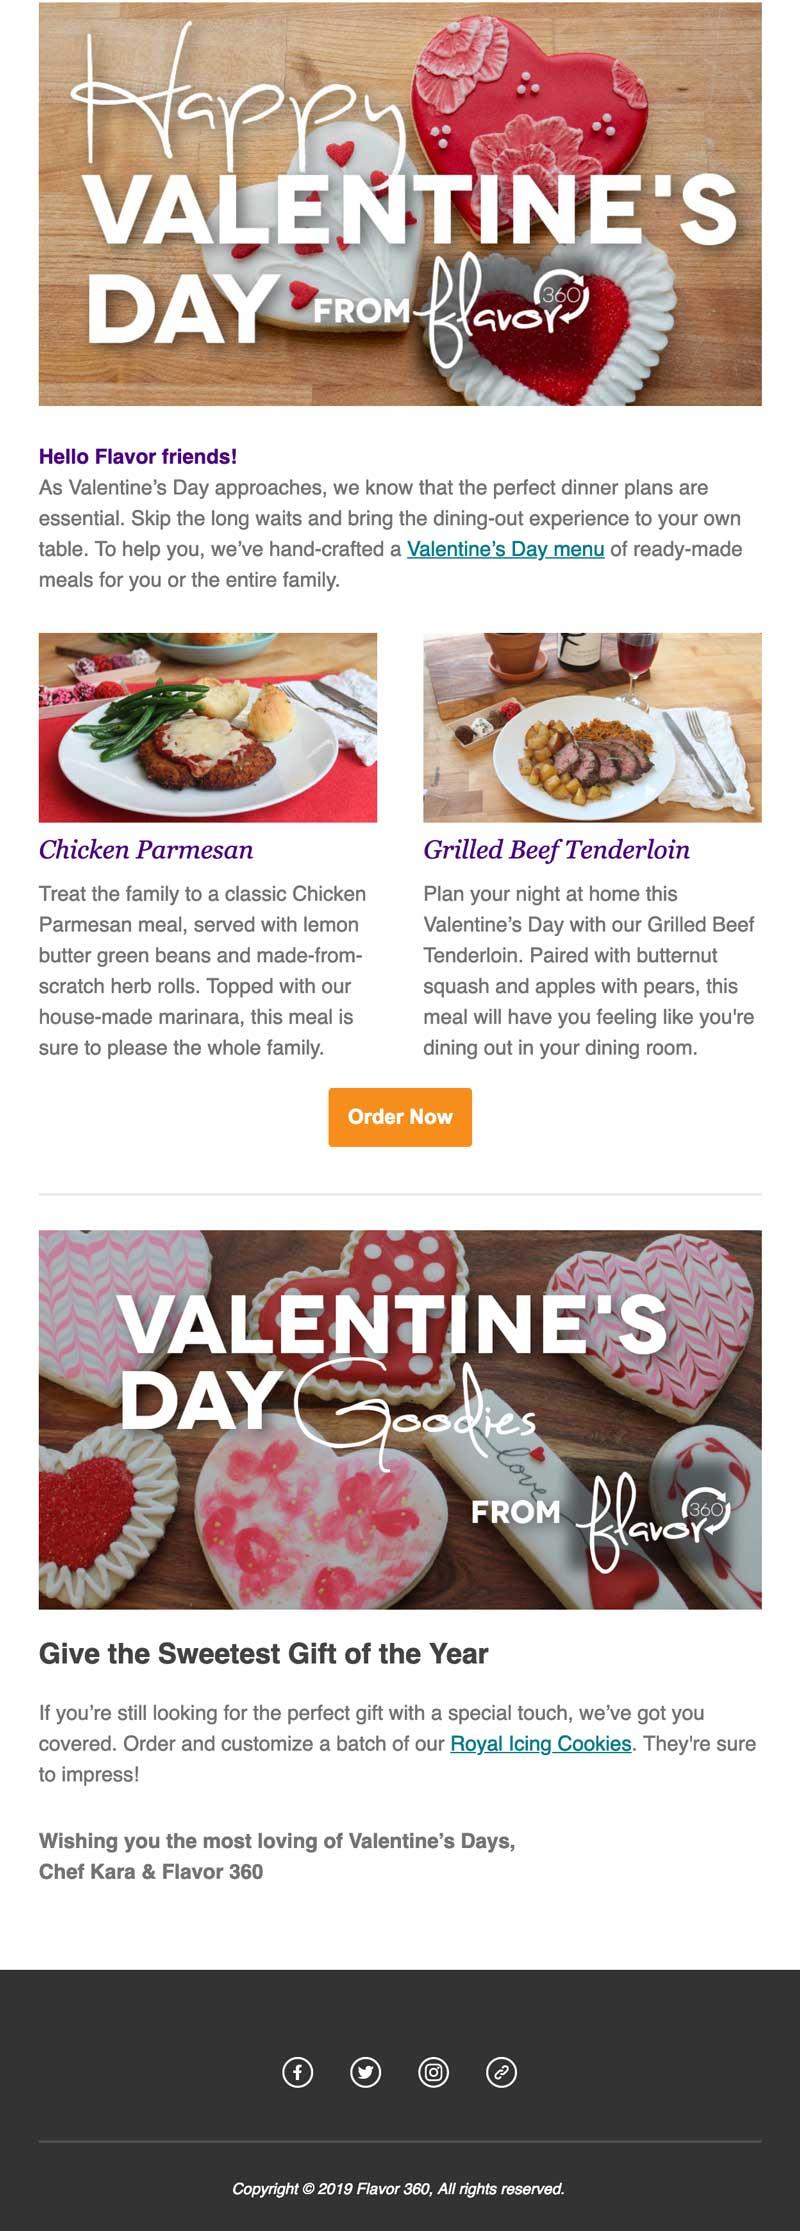 Flavor 360 - Valentine's Day Eblast